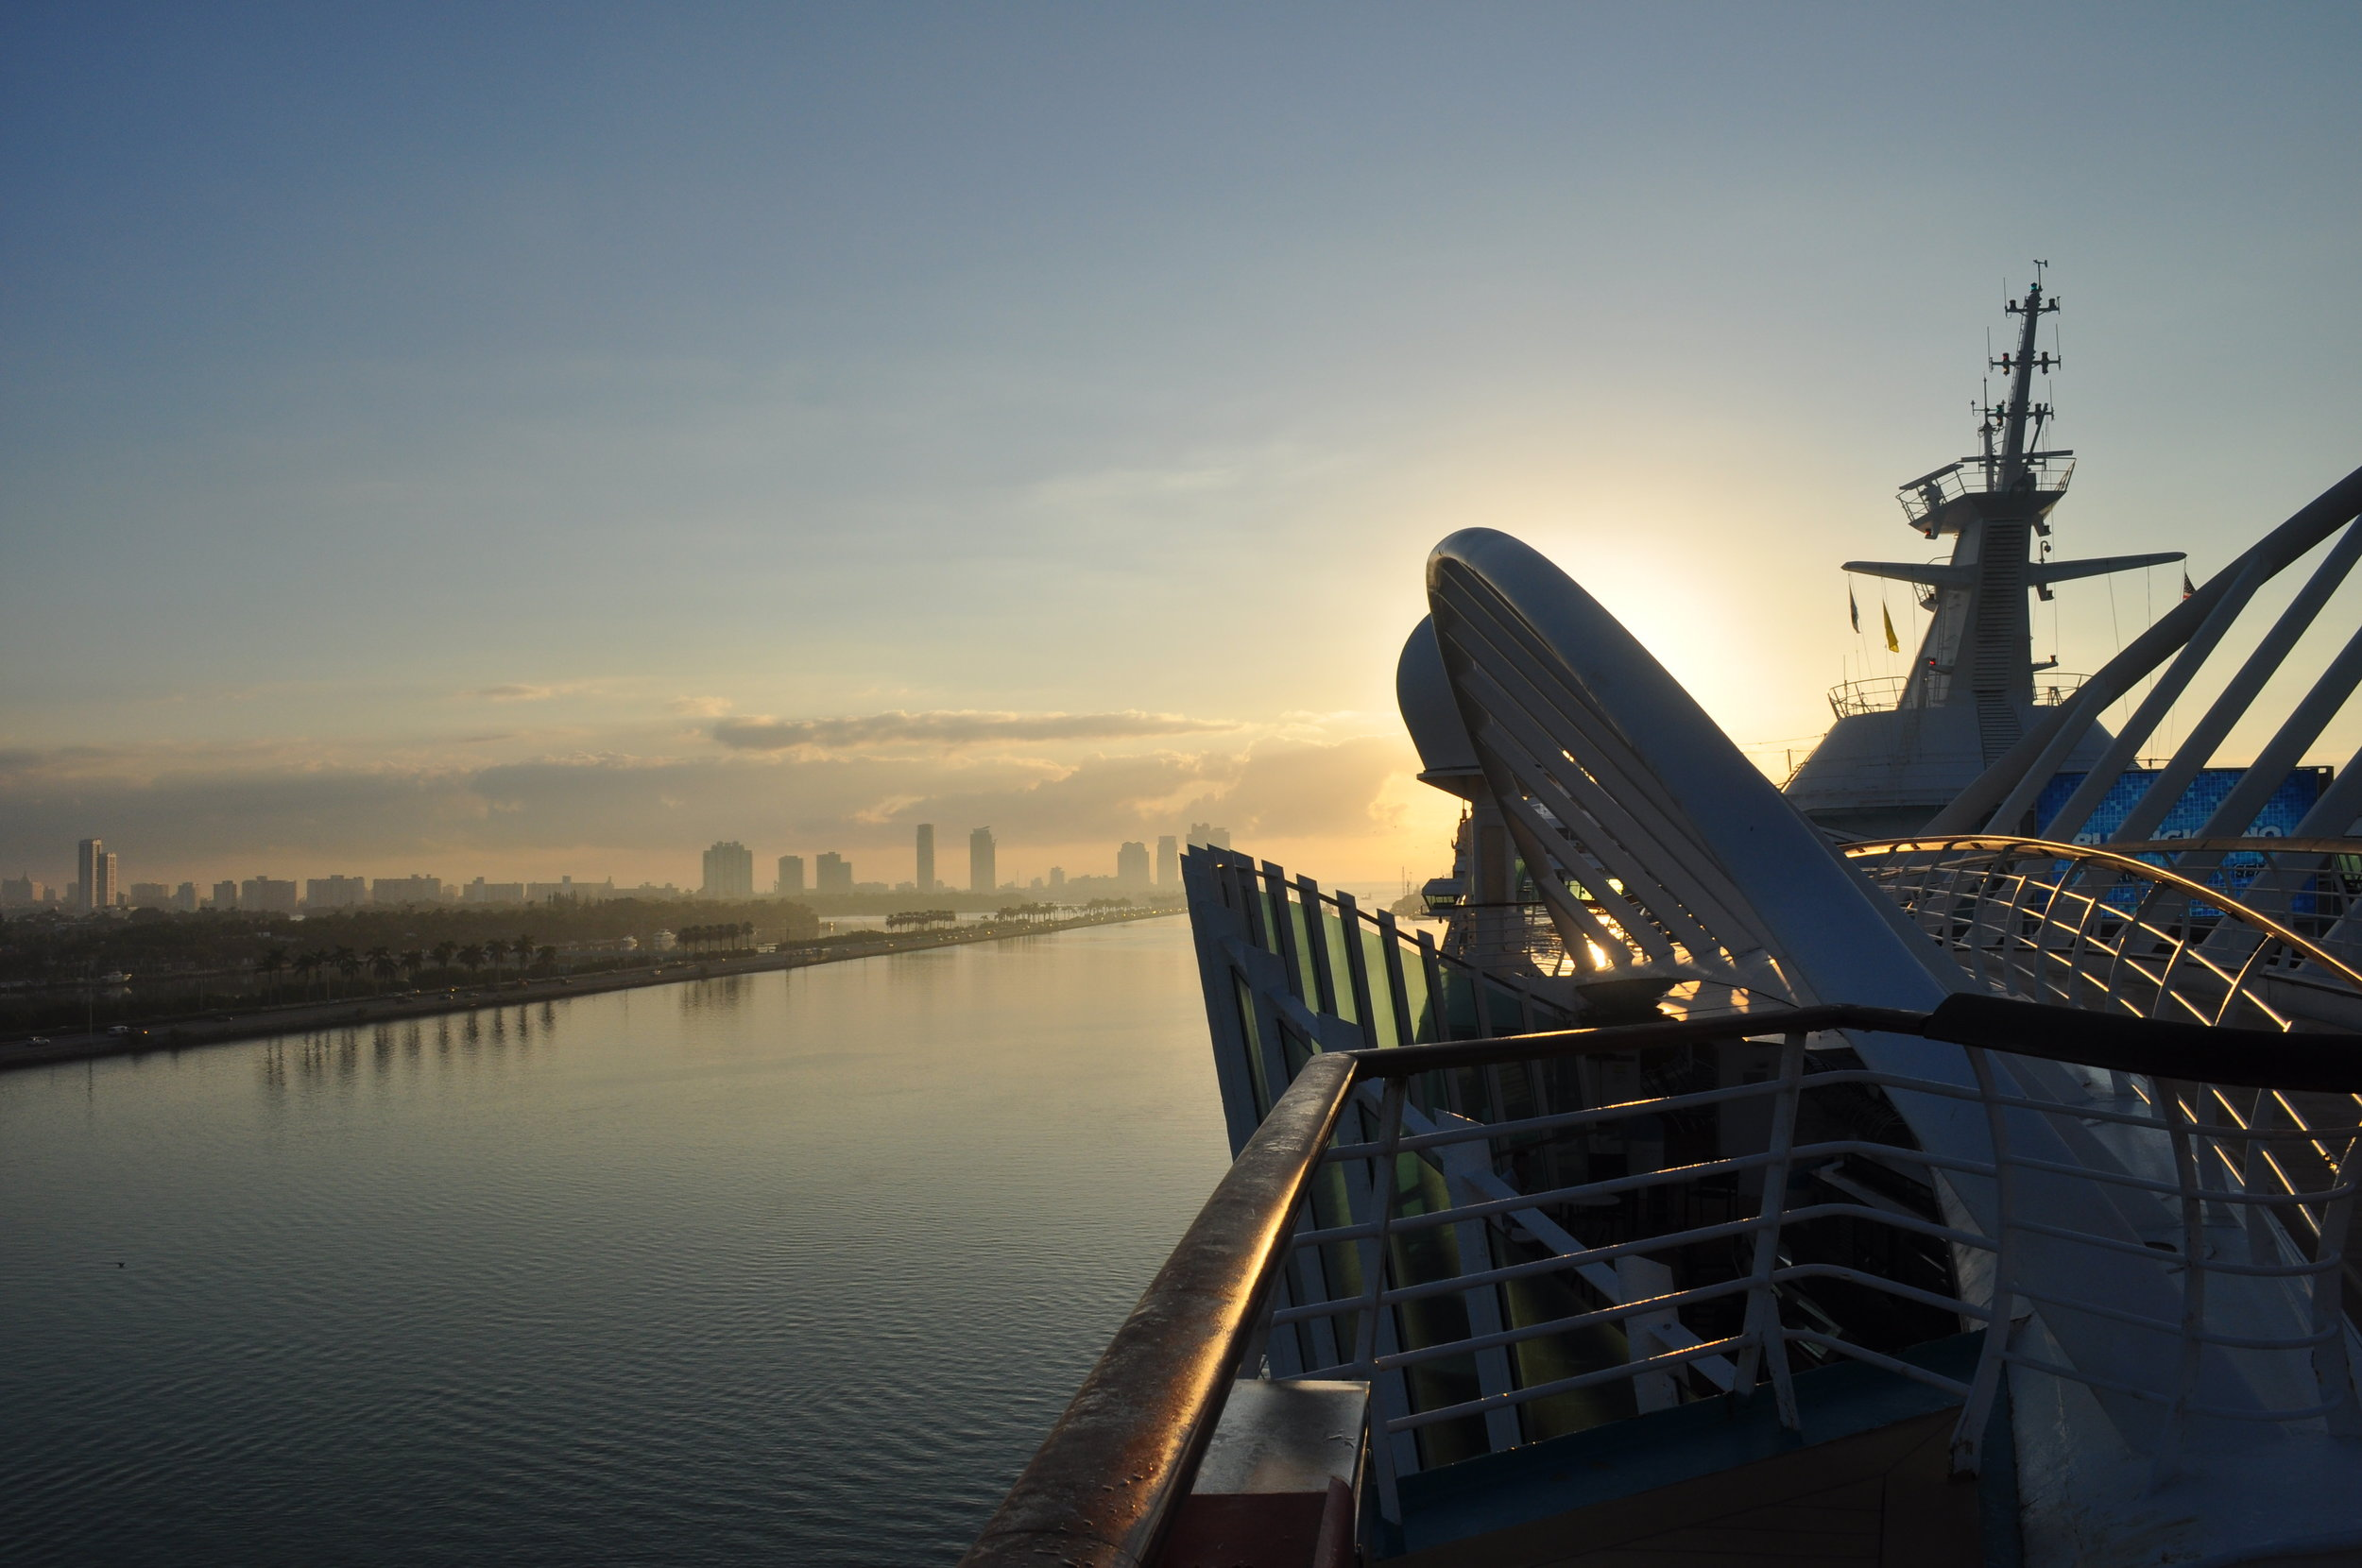 4-Night Bahamas Cruise on Enchantment of the Seas - A Happy Passport #cruise #miami #bahamas